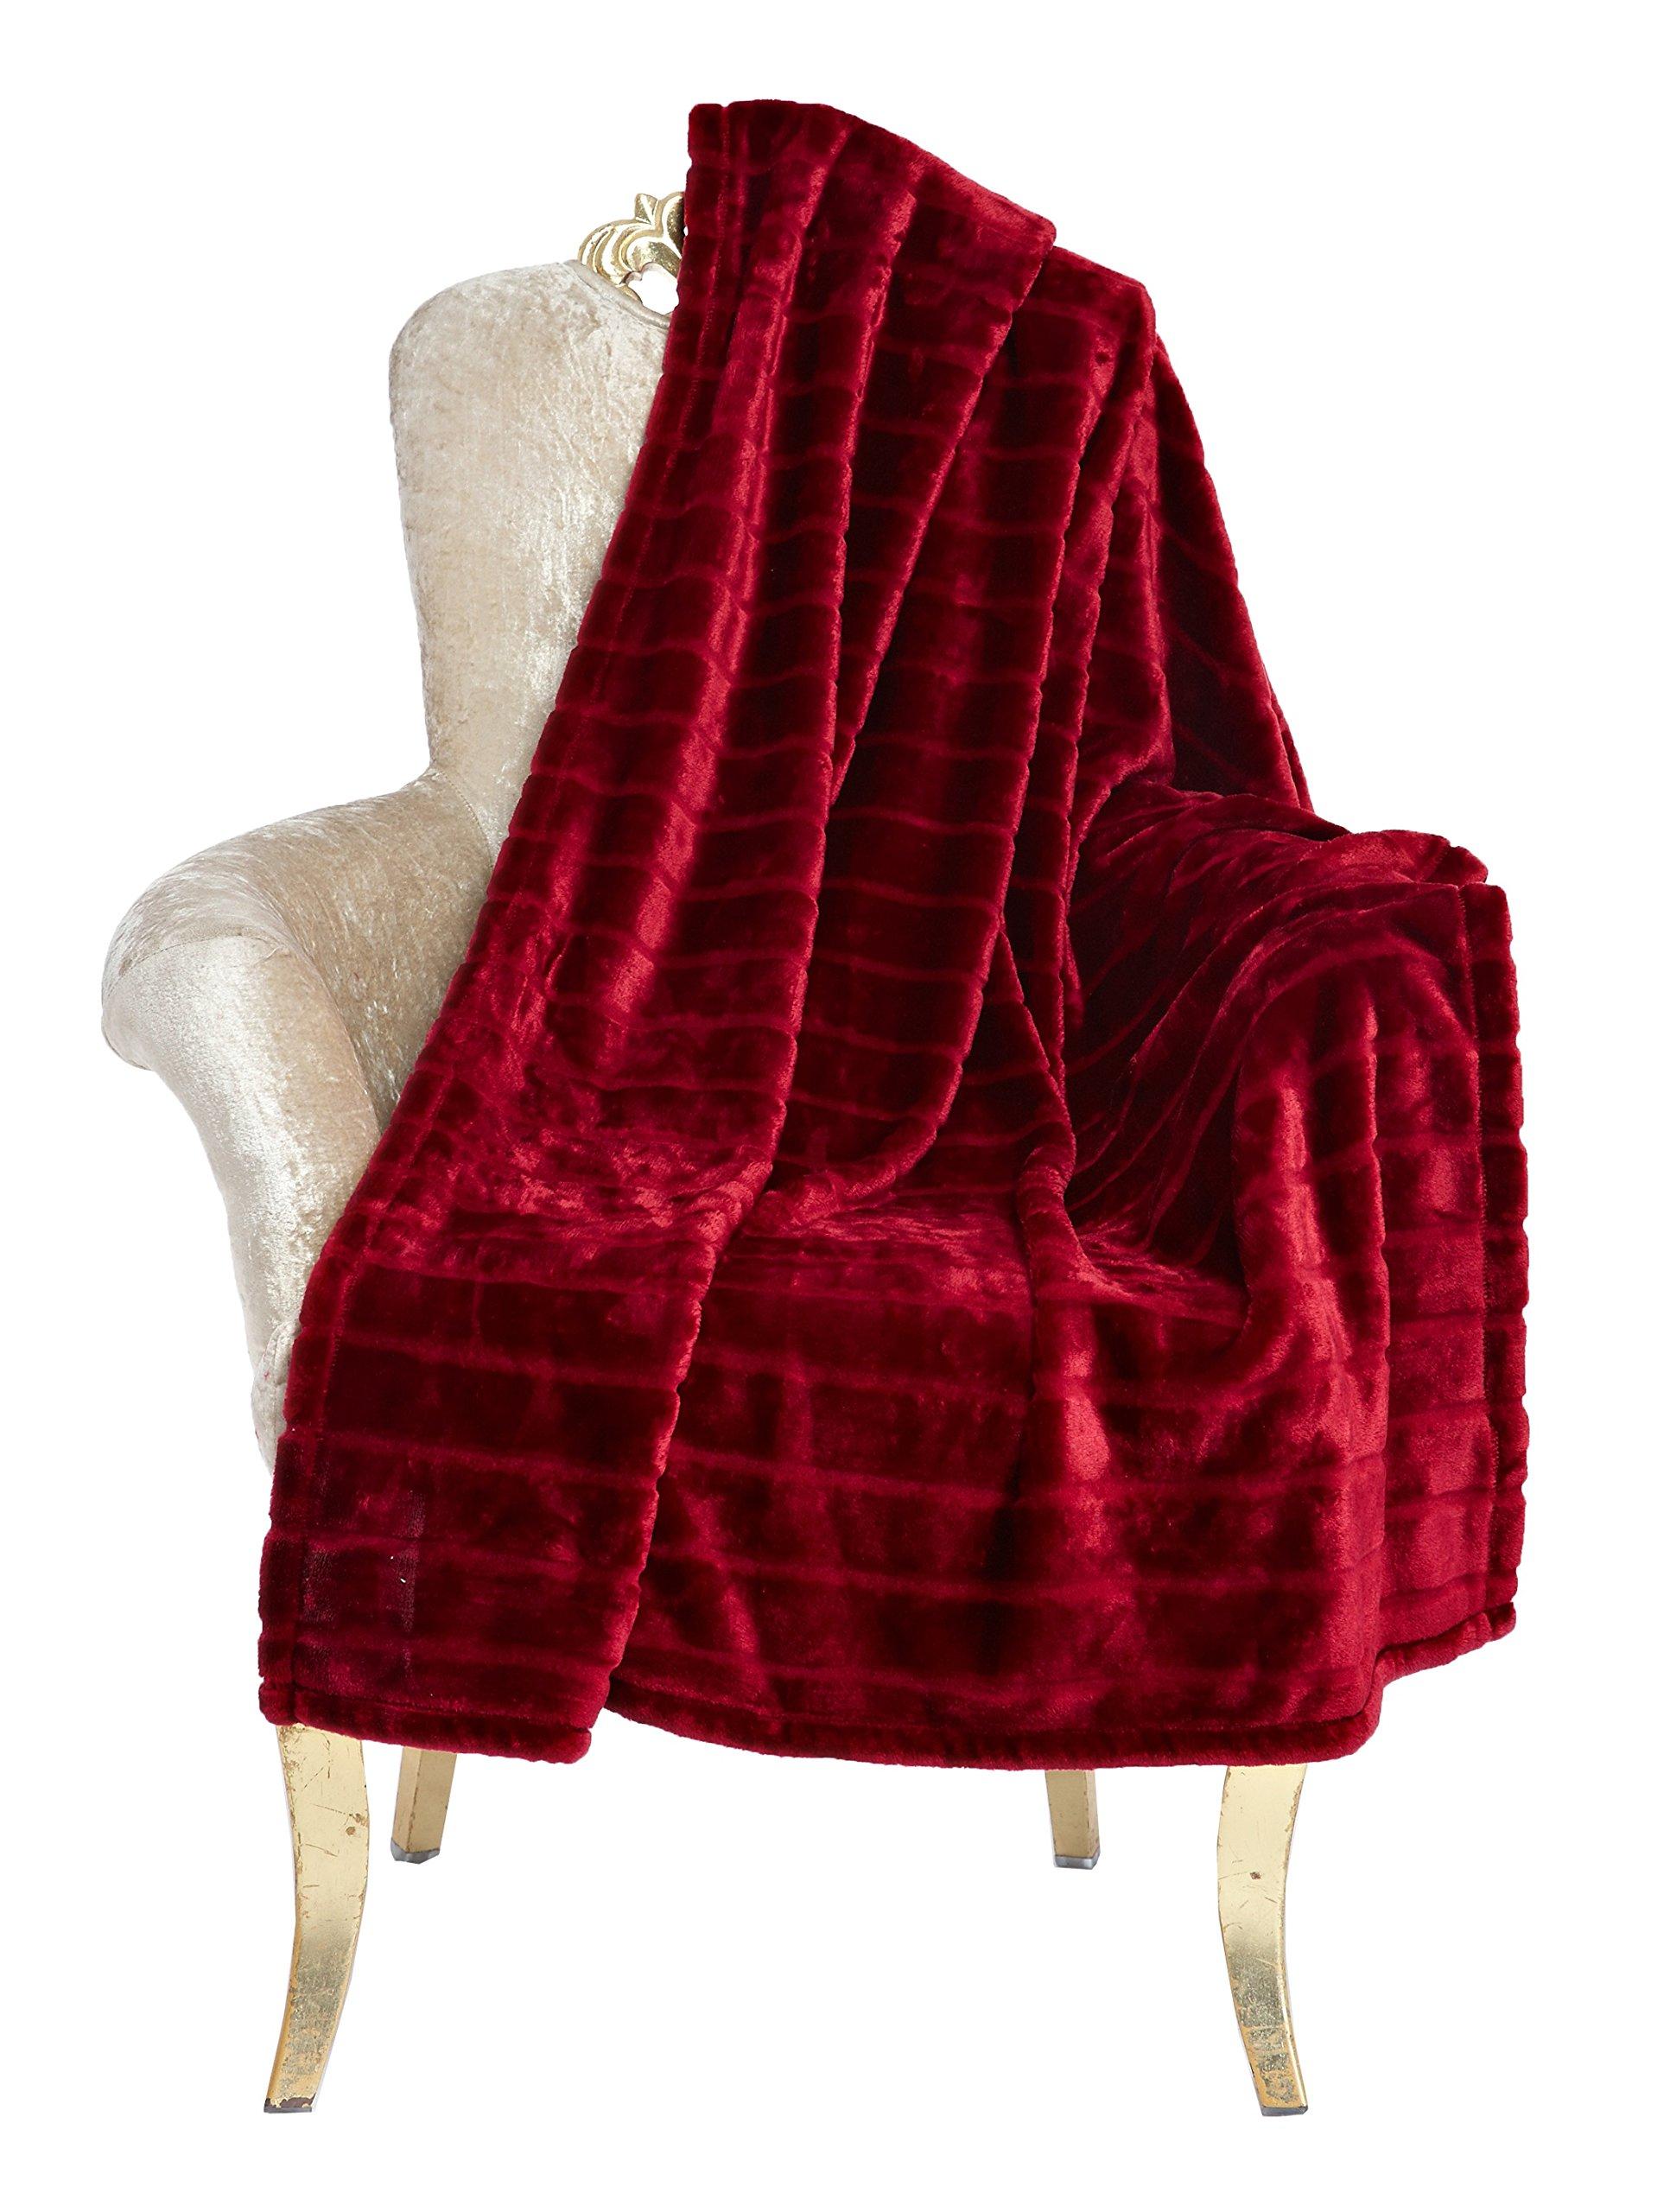 Bertte Ultra Velvet Plush Super Soft Decorative Stripe Throw King Size Bed Blanket- 102''x 90'', Burgundy